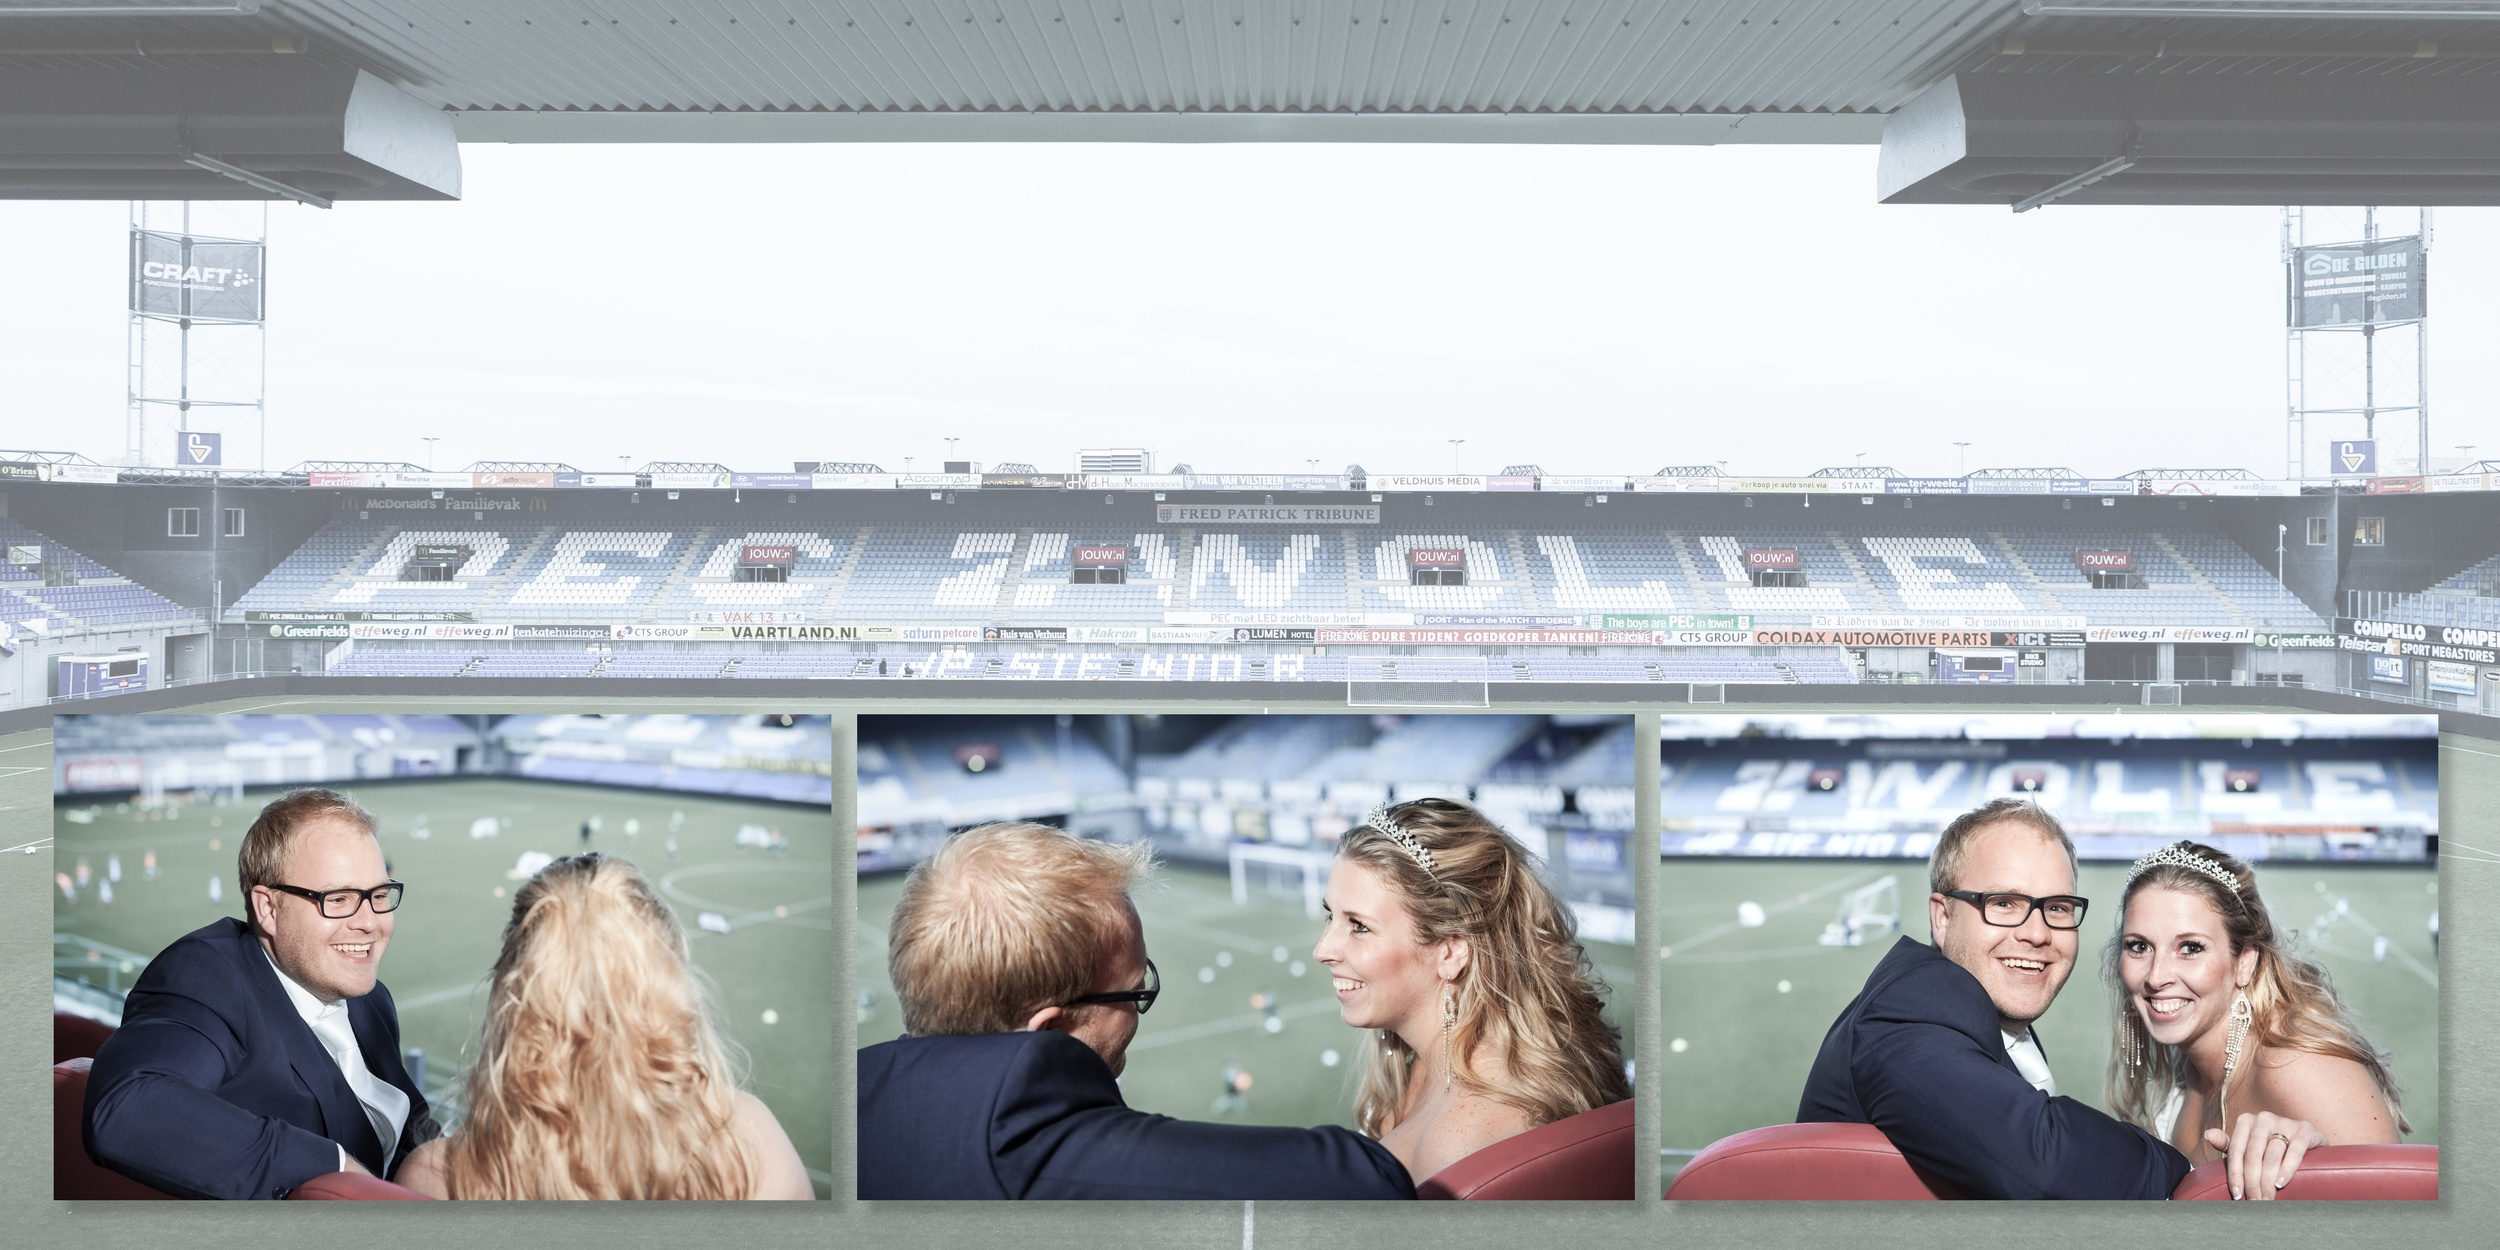 PEC Zwolle Stadion